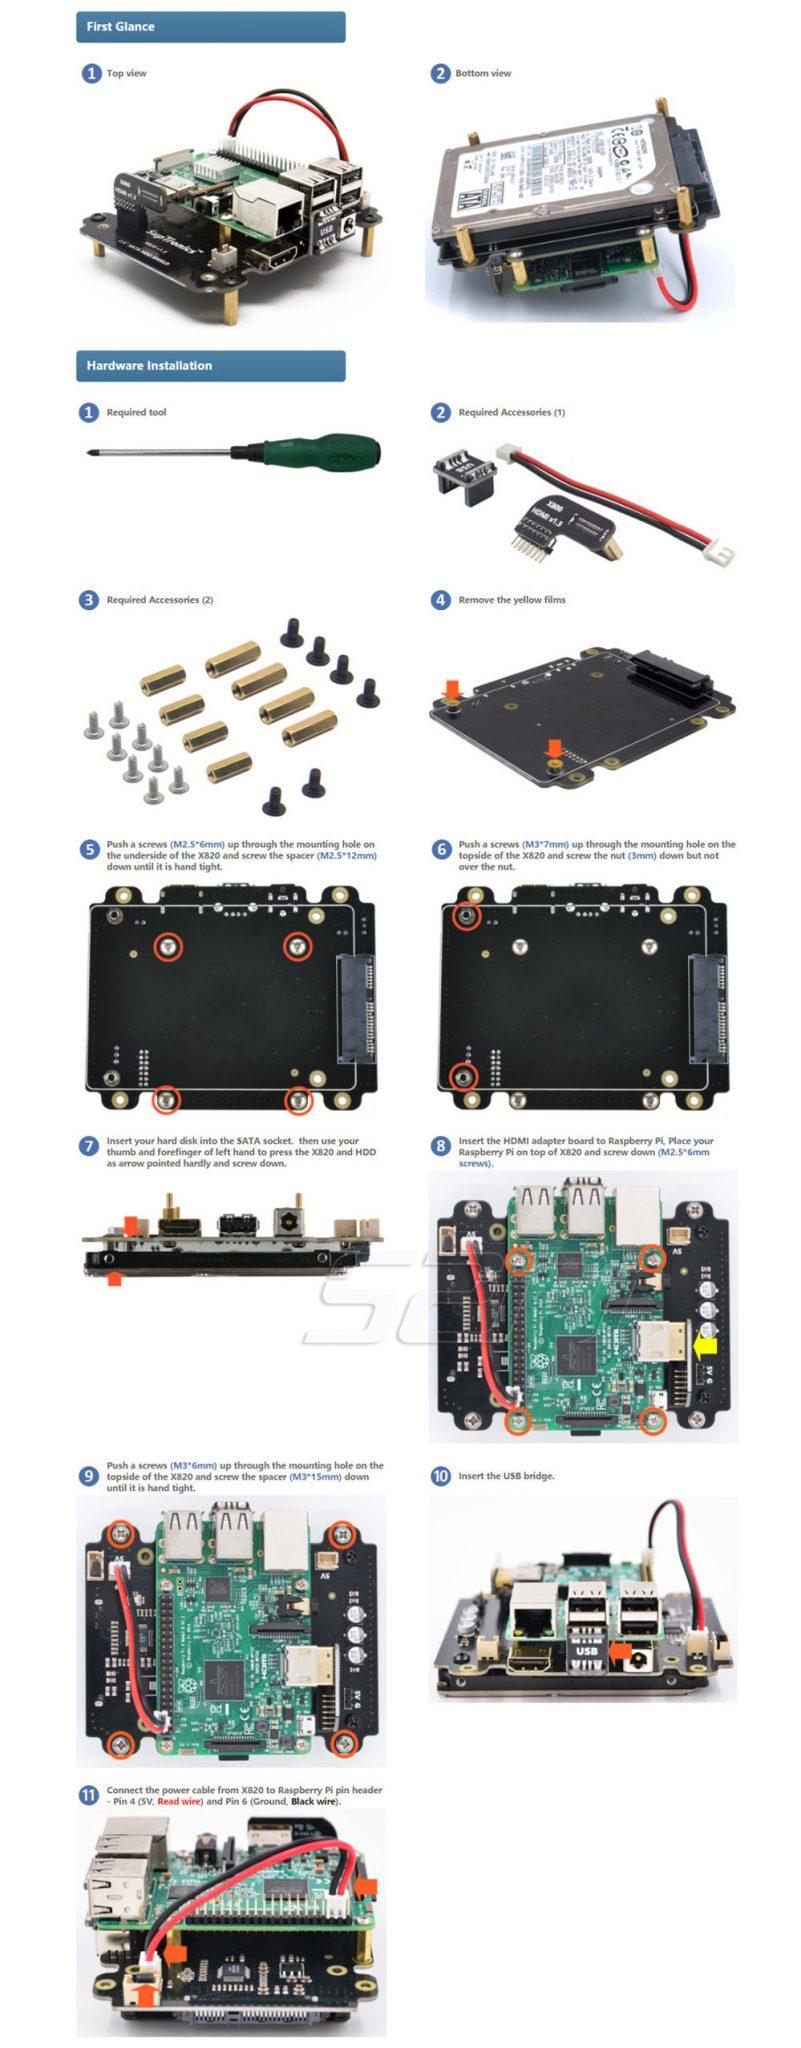 Плата расширения x820 для Raspberry Pi для подключения 2.5 дюймов SATA HDD/SSD